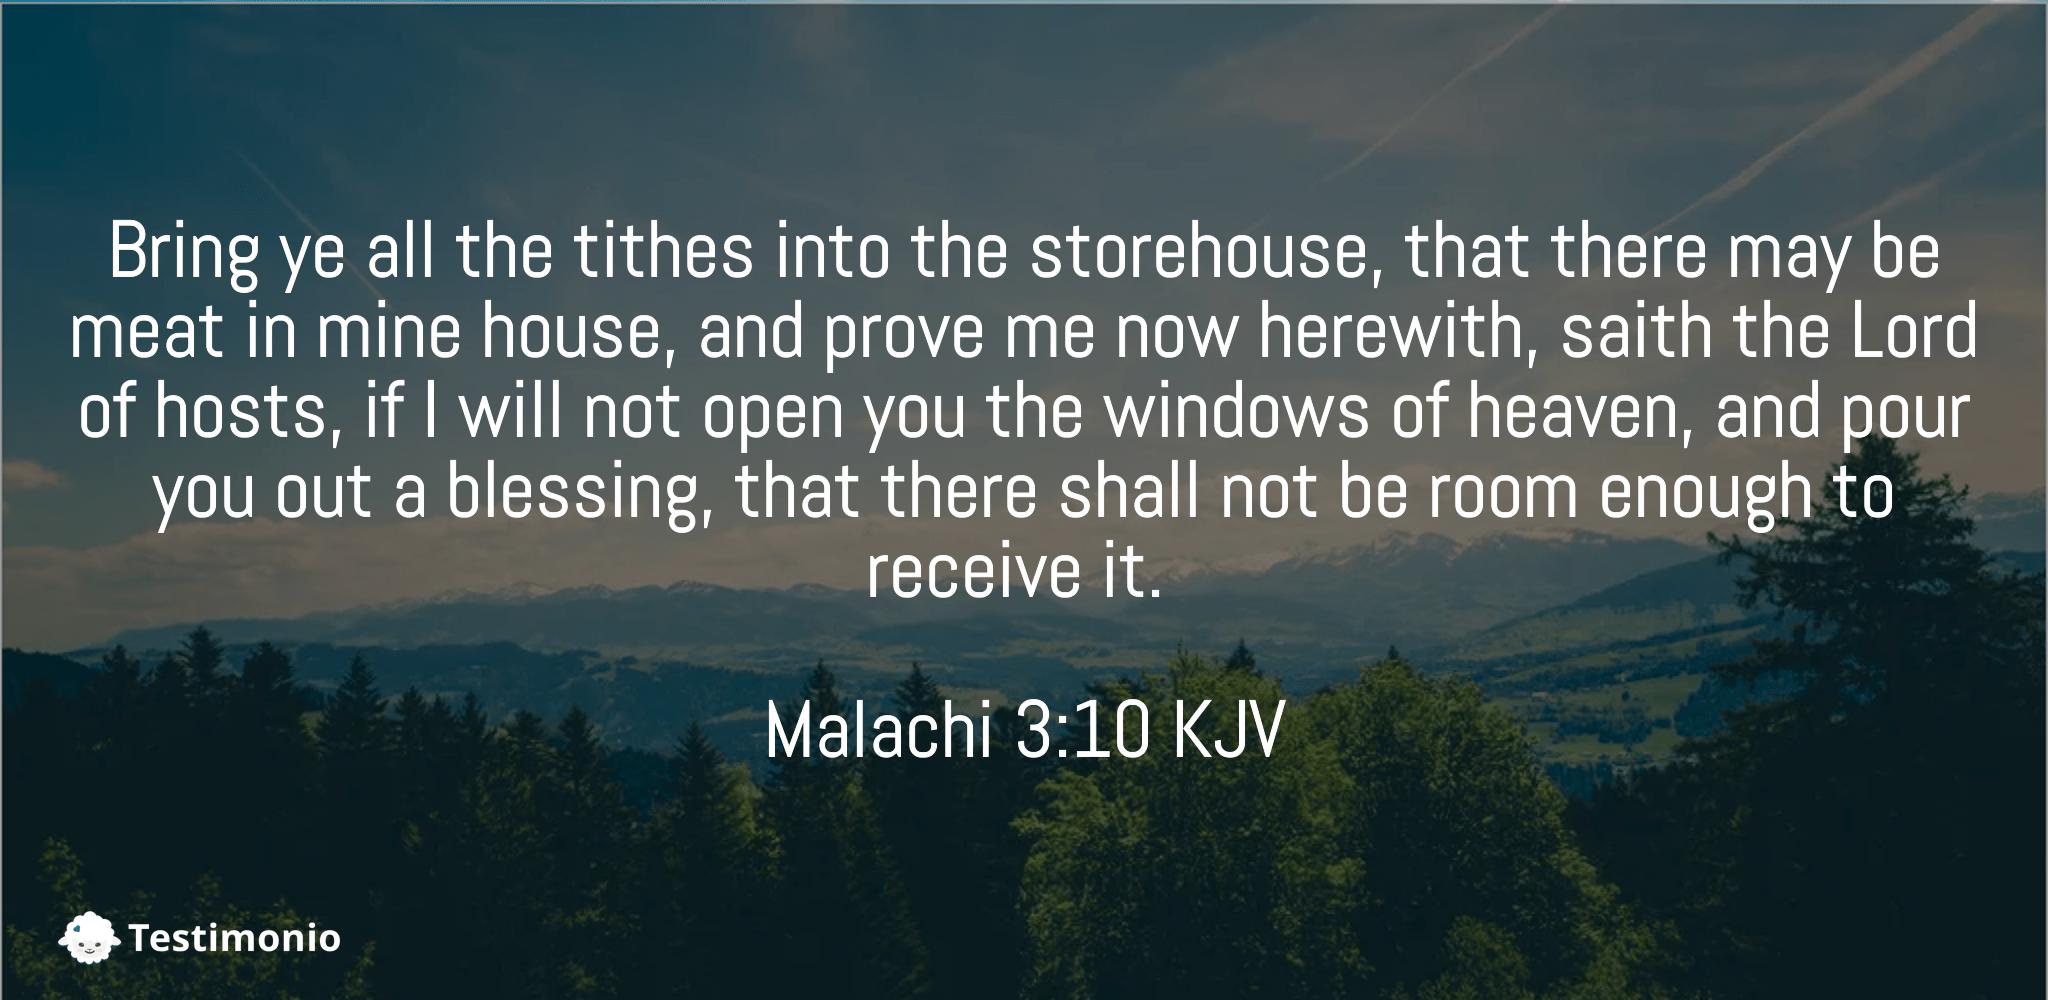 Malachi 3:10